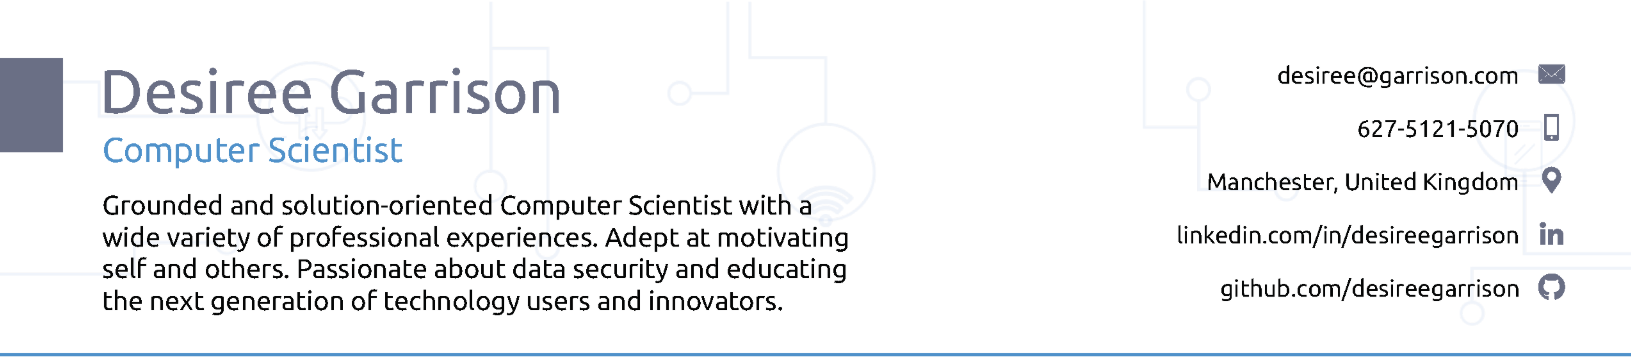 Computer Scientist Resume Header Example